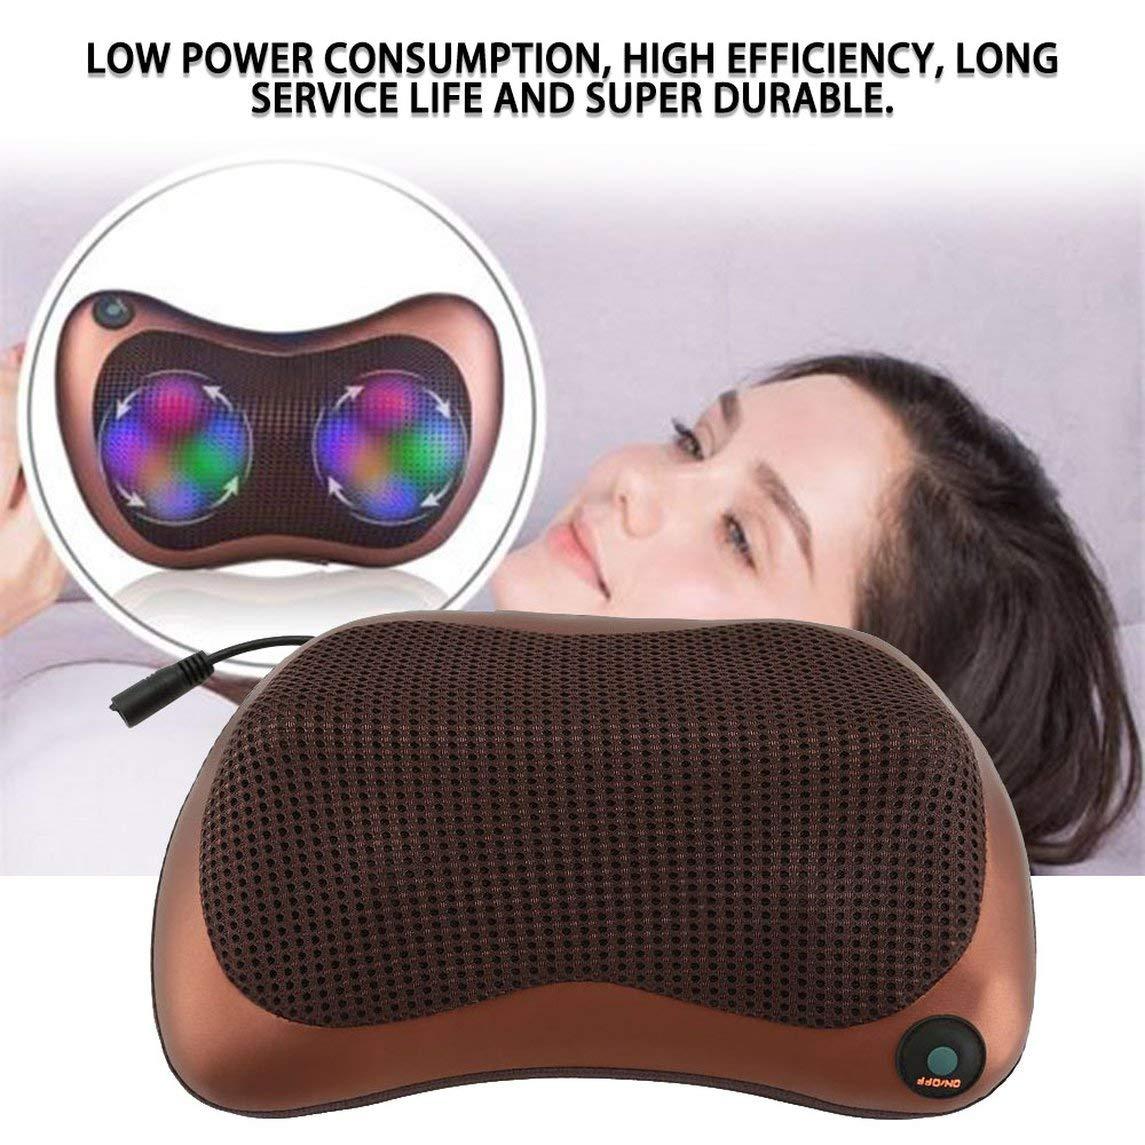 Massage Pillow Waist Shoulder Cervical Leg Multi-Function Massage Pillow by Magicalworld (Image #2)